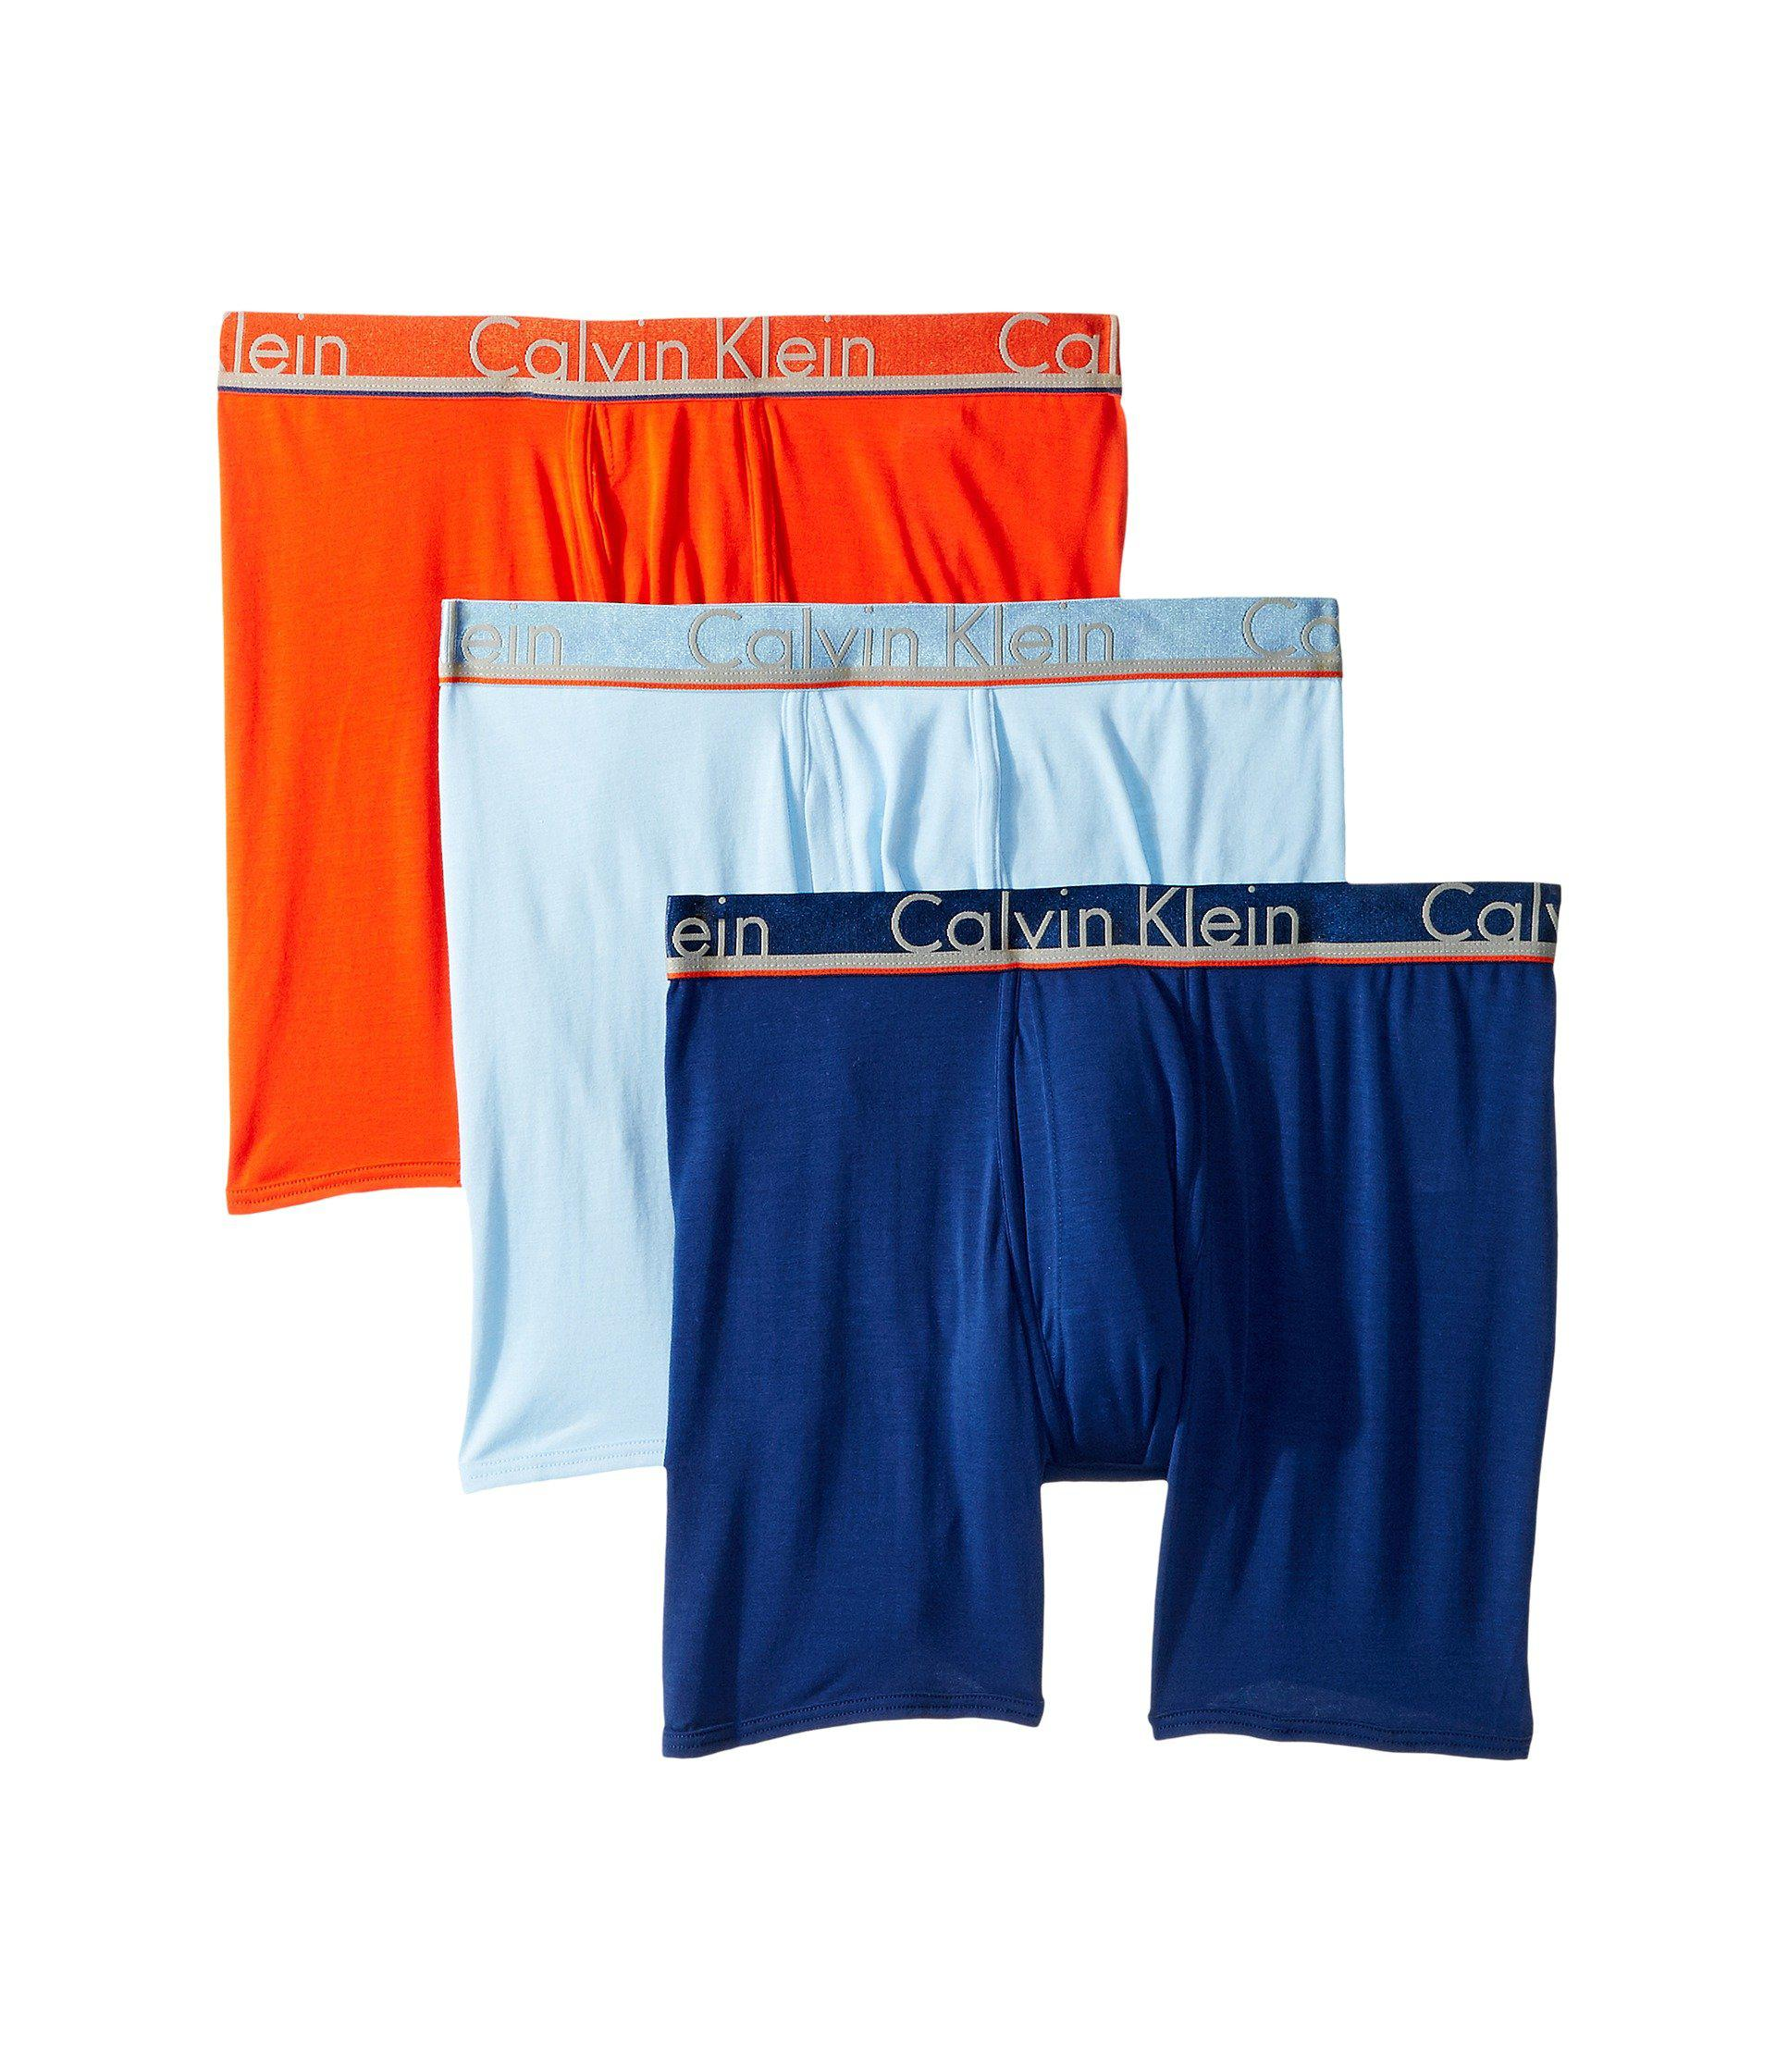 8e4361163259 Lyst - Calvin Klein Comfort Microfiber 3-pack Boxer Brief (black ...